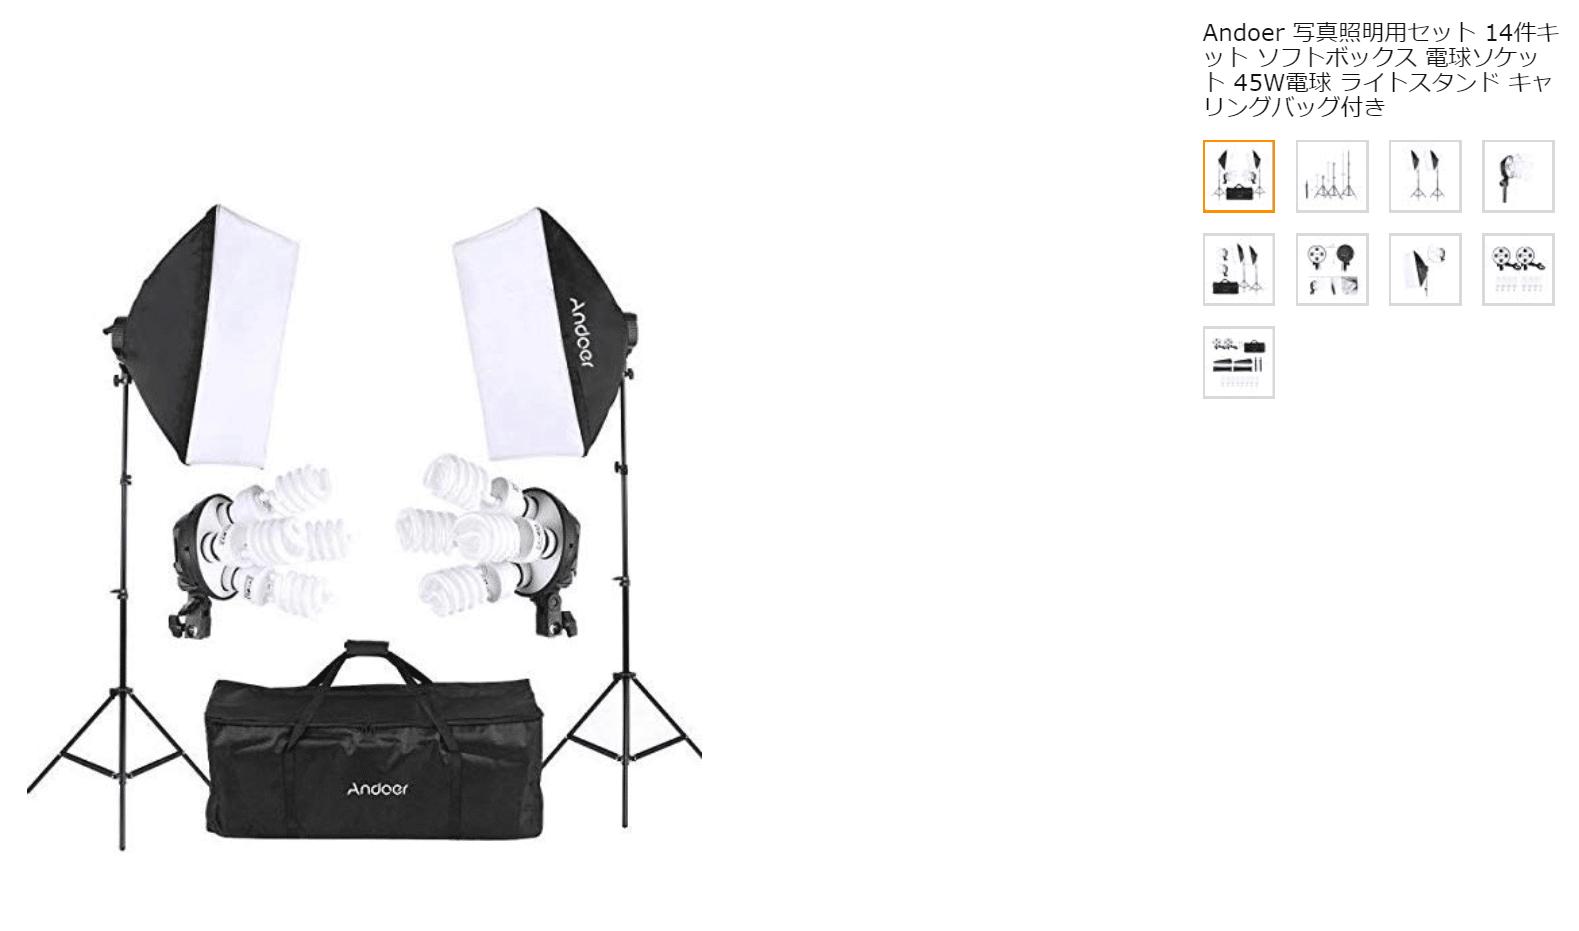 Youtuberにおすすめの照明機材③:ANDOER ライトスタンド ソフトボックス付き